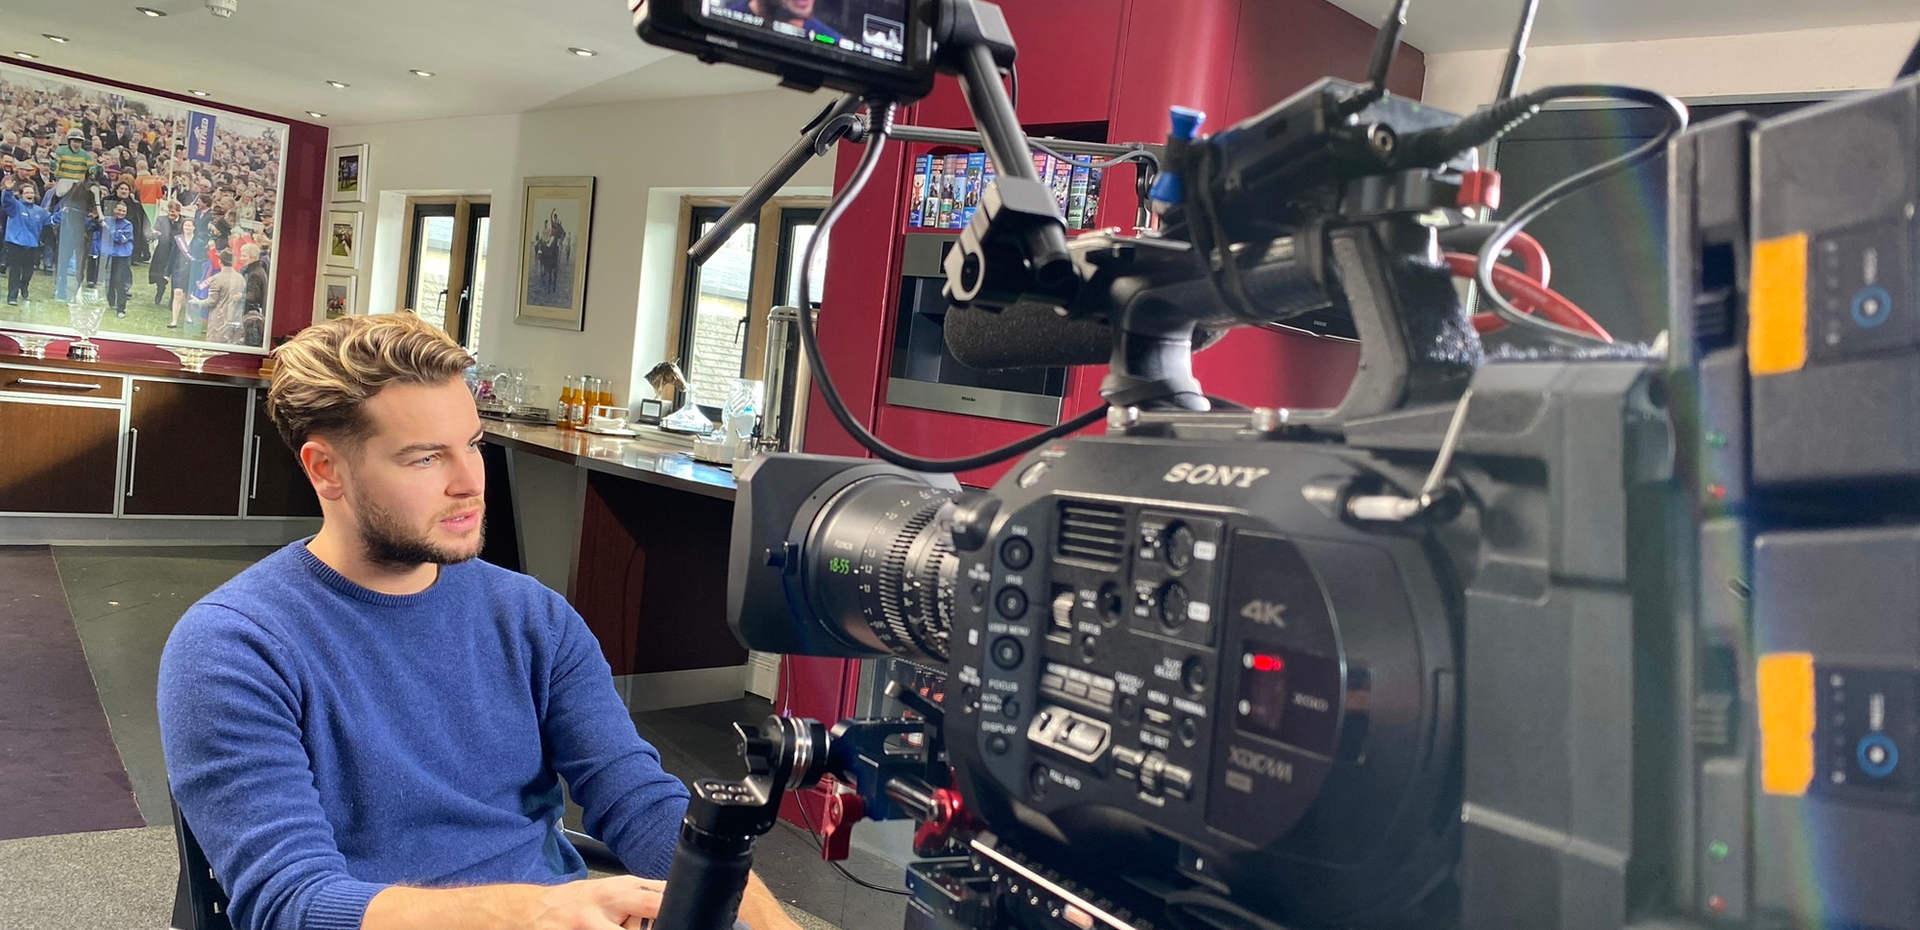 Coral - Chris Hughes Interview at Jonjos